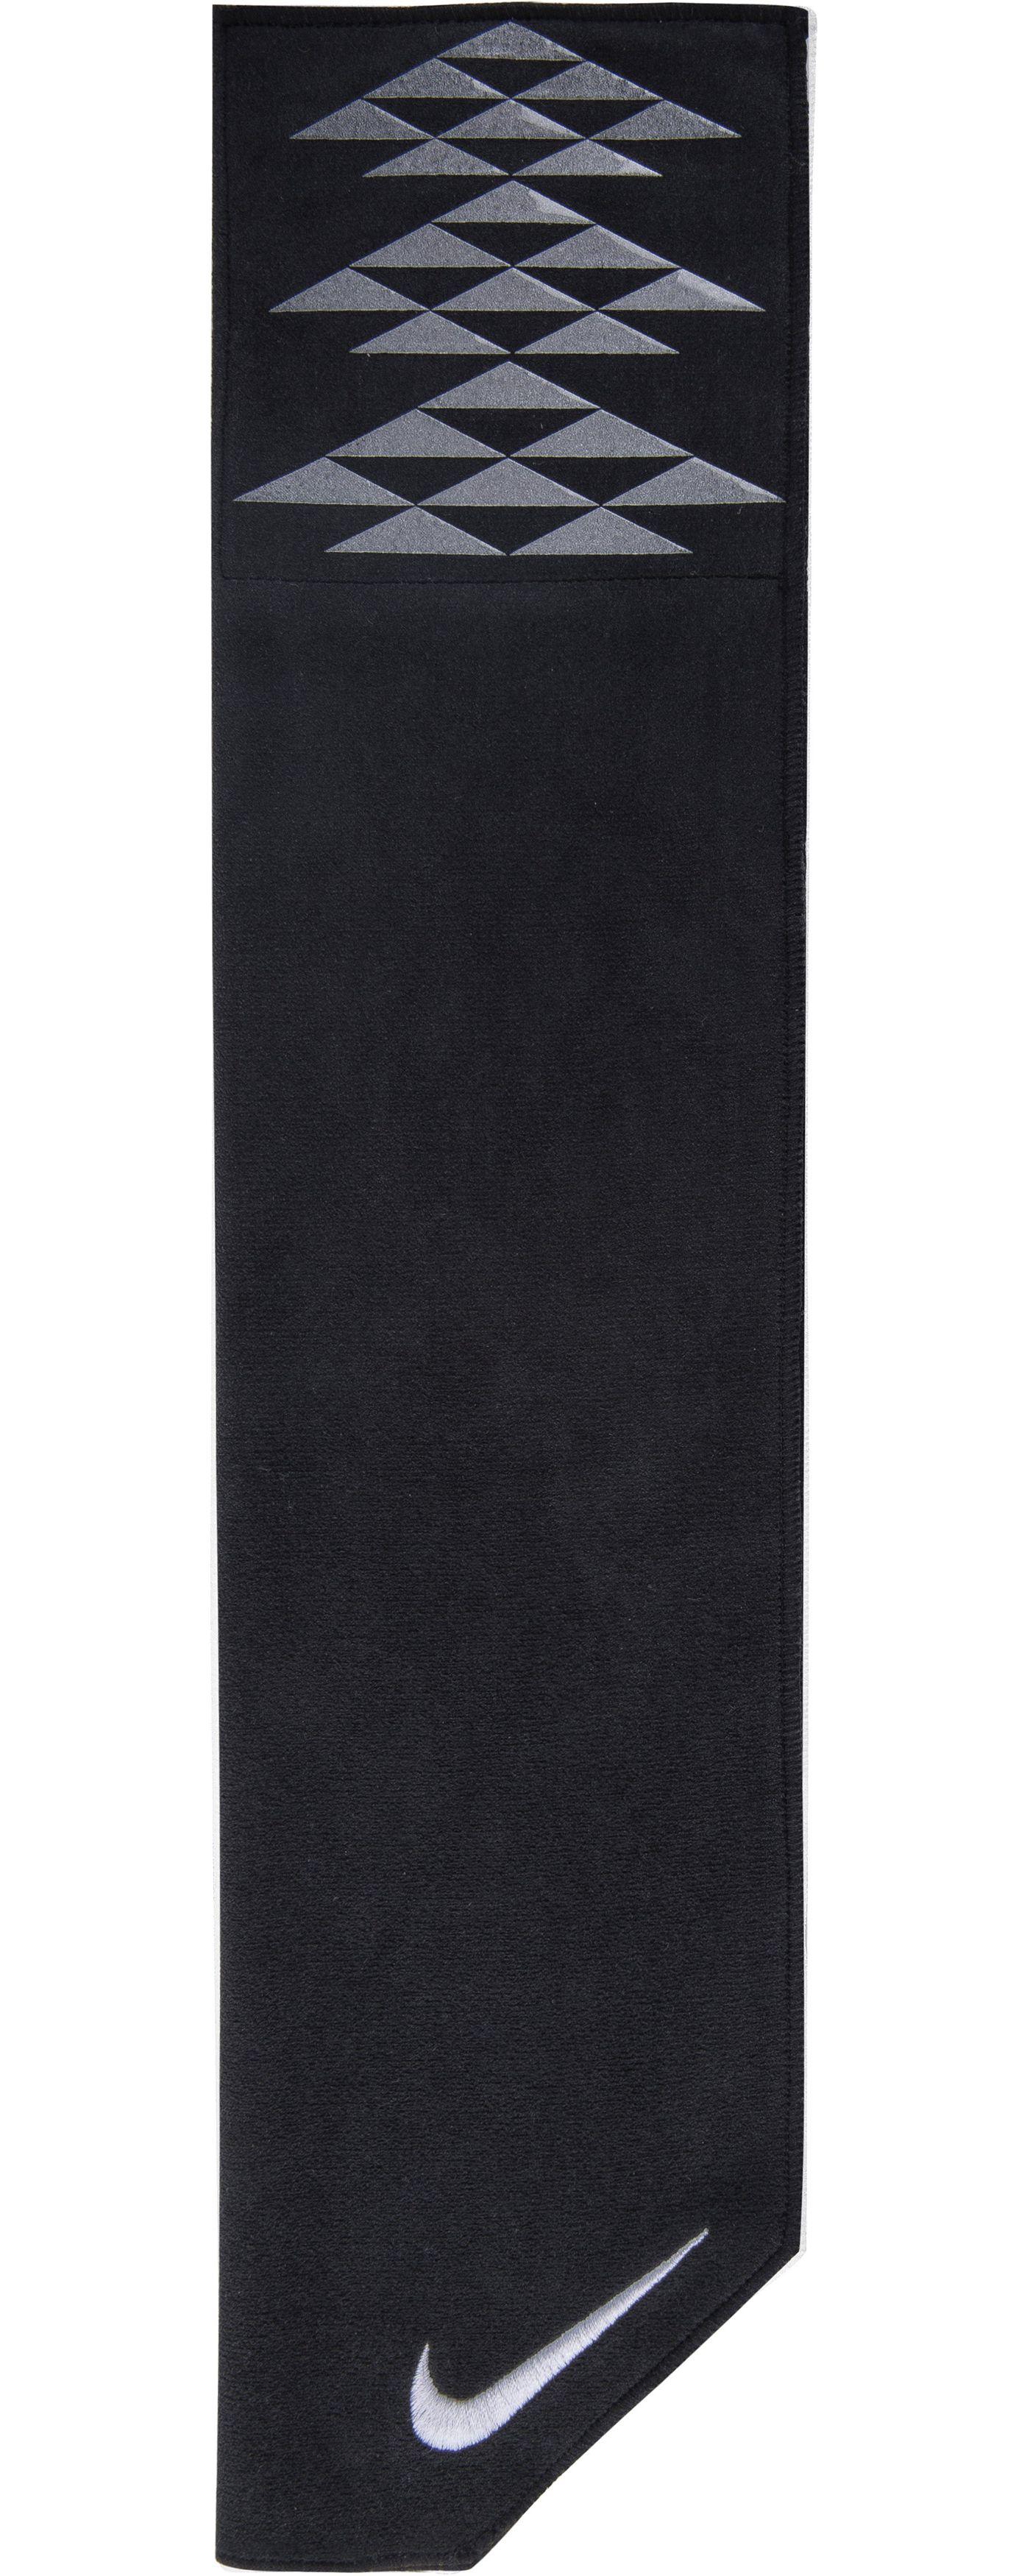 Nike Vapor Football Towel